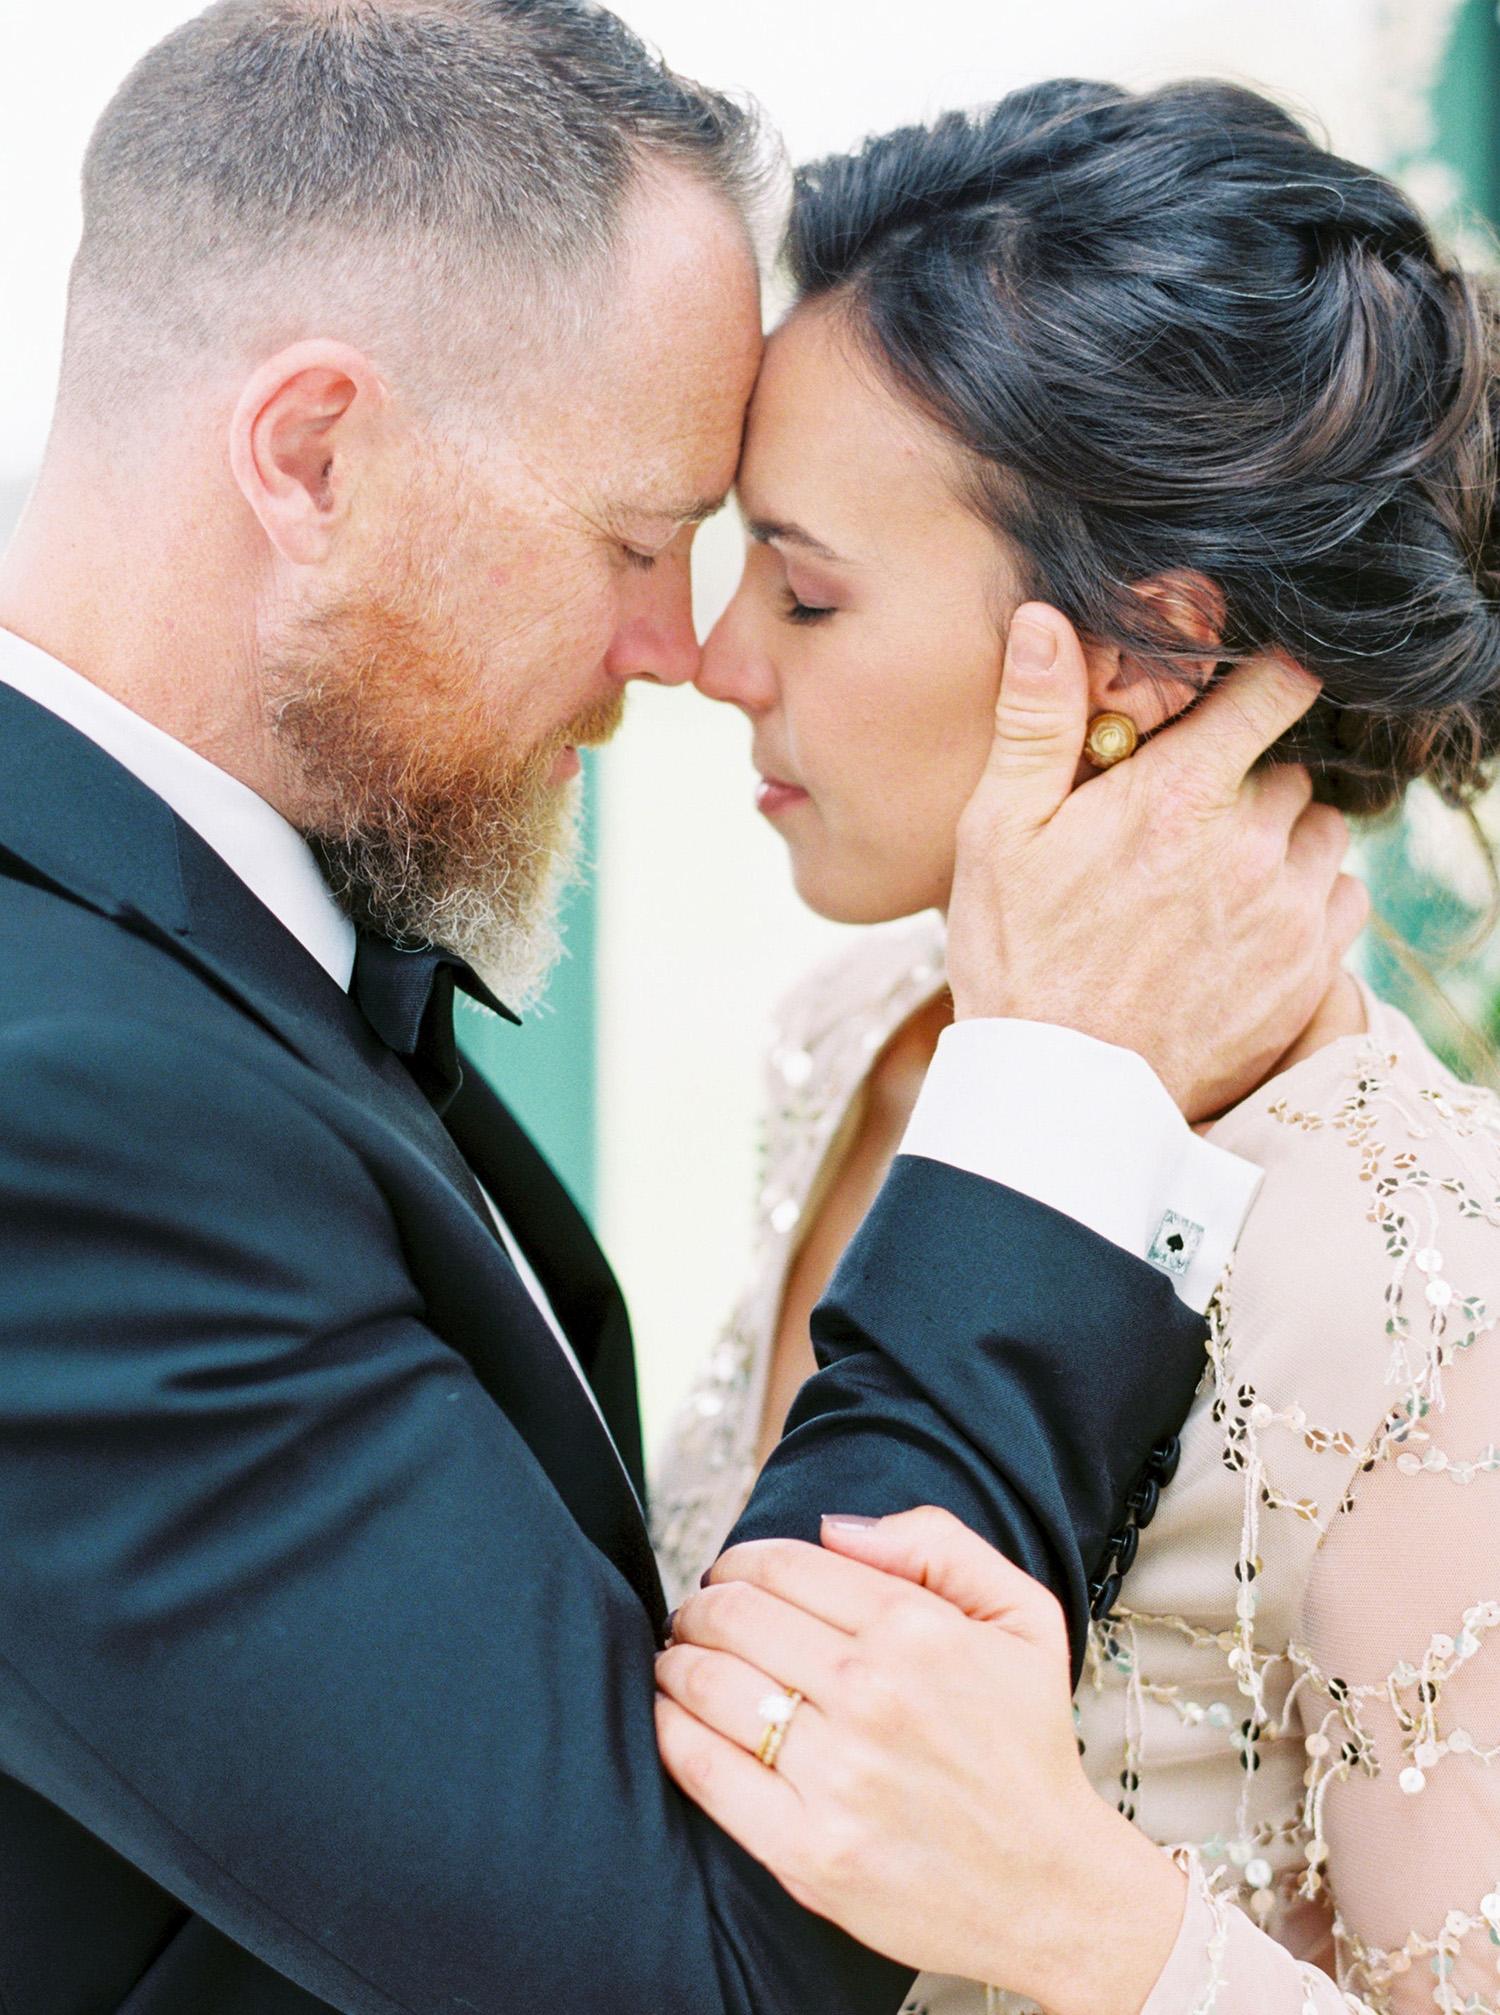 evan dustin vow renewal bride groom couple